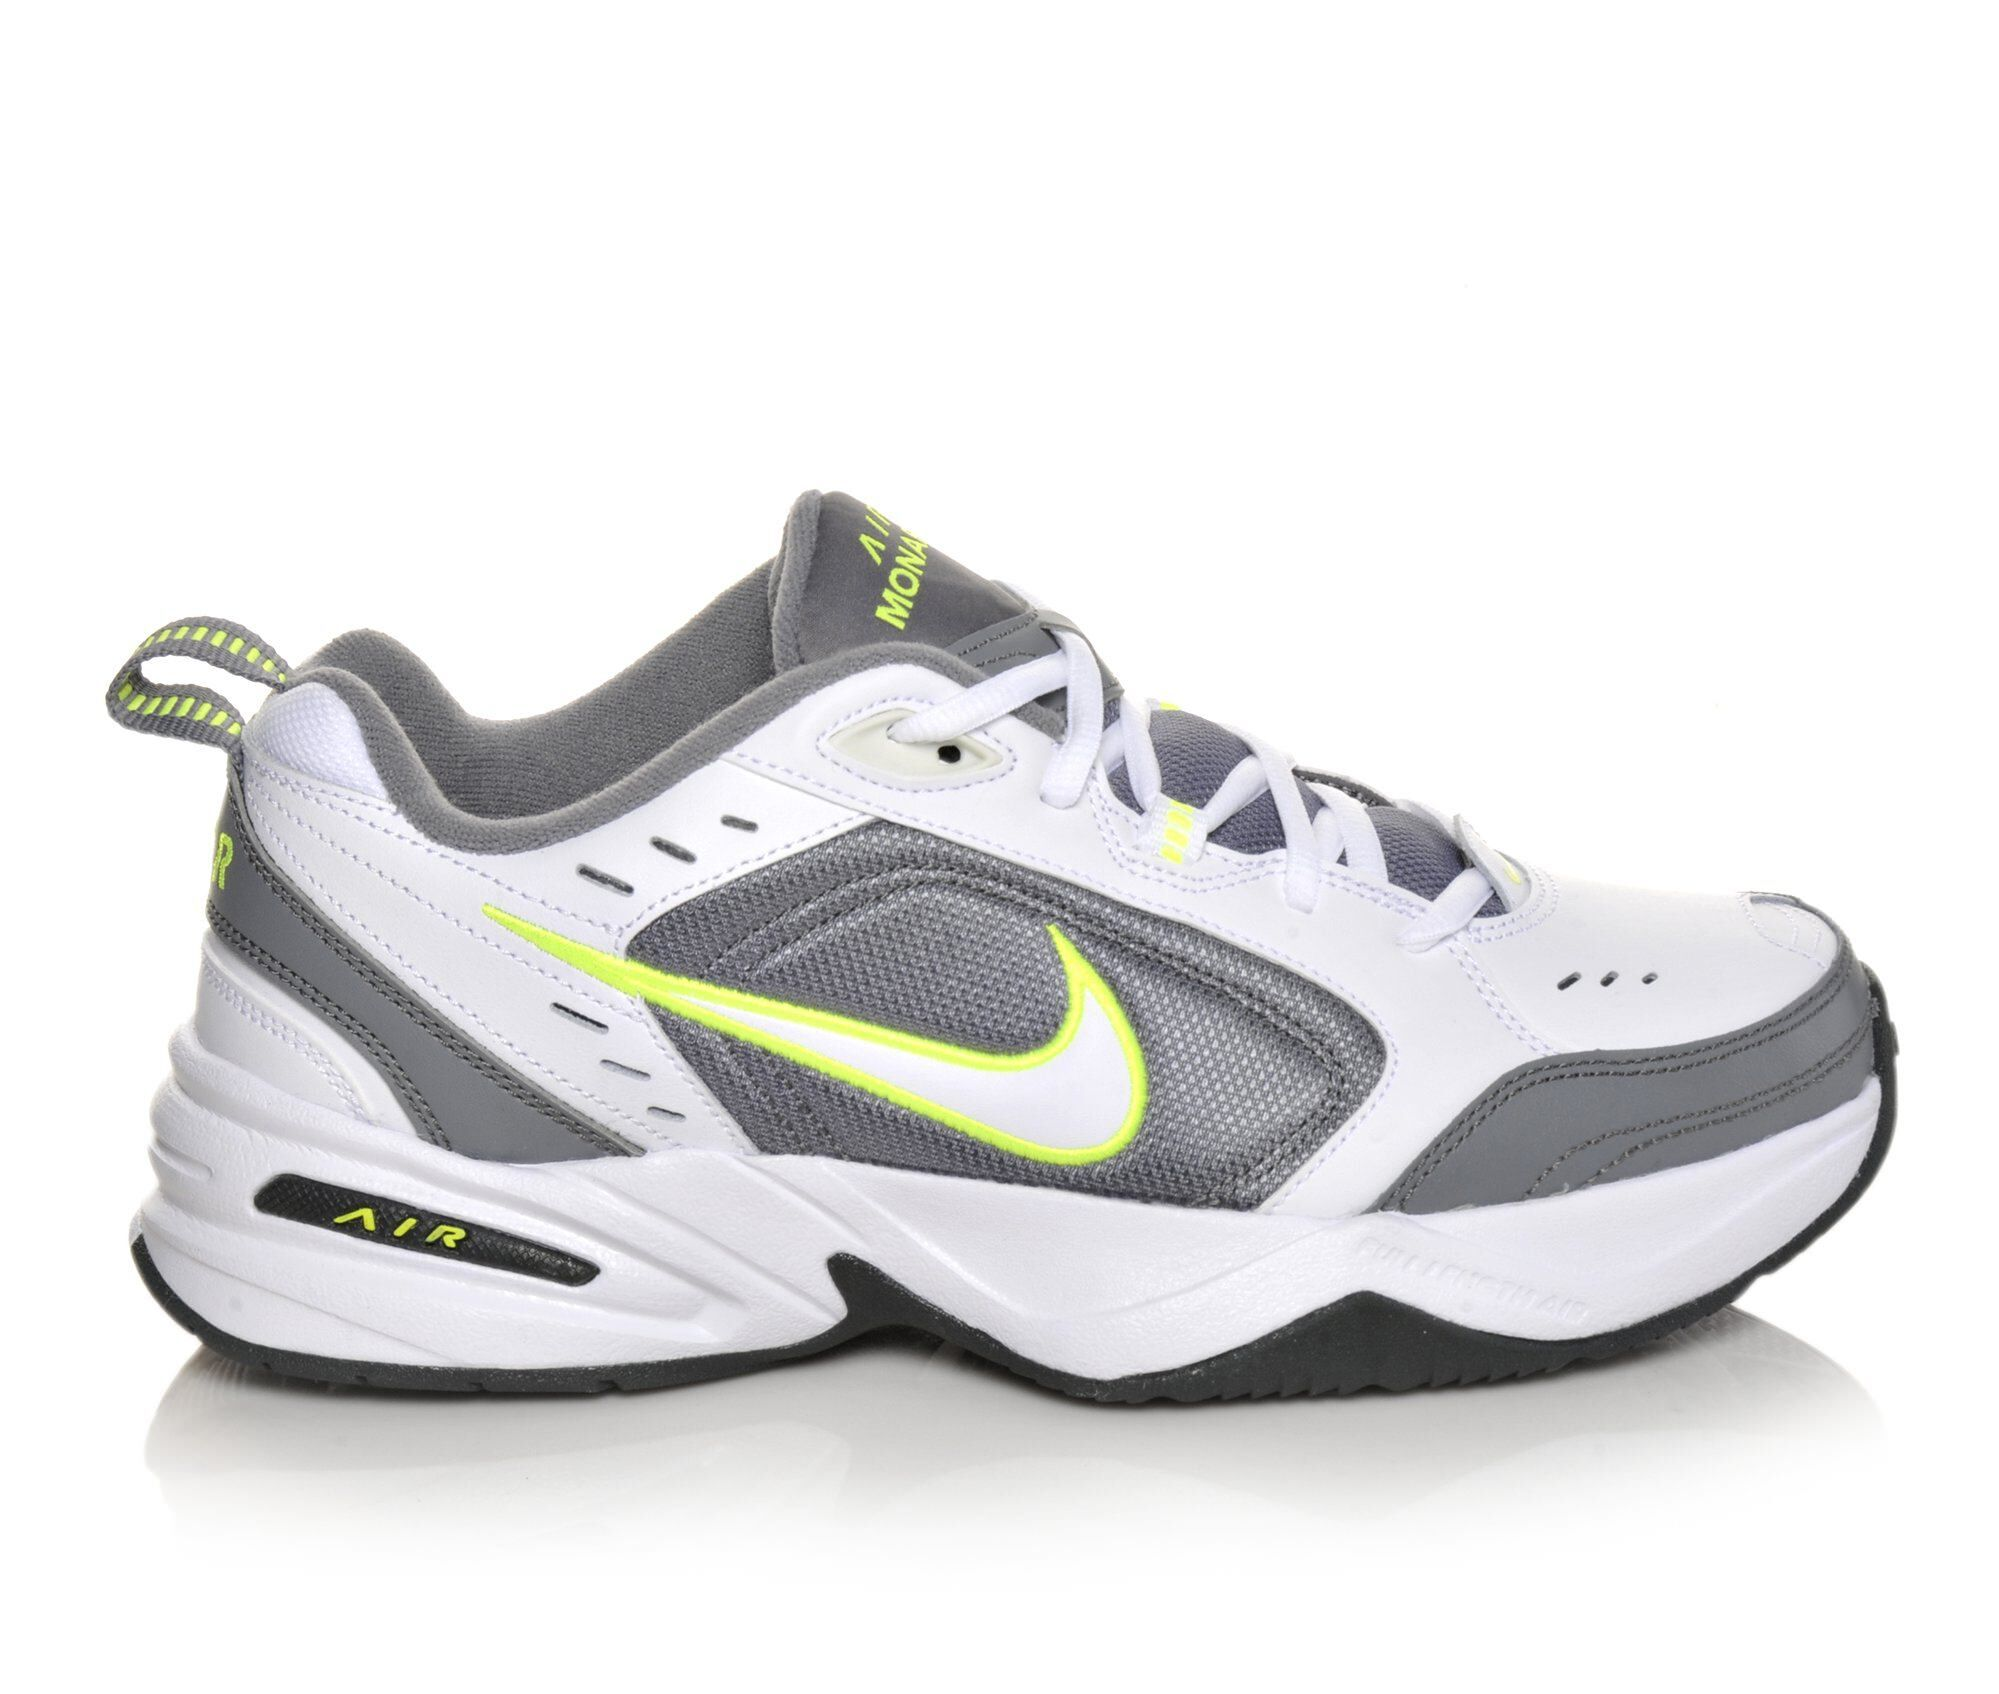 Men's Nike Air Monarch IV Training Shoes White/Grey/Volt